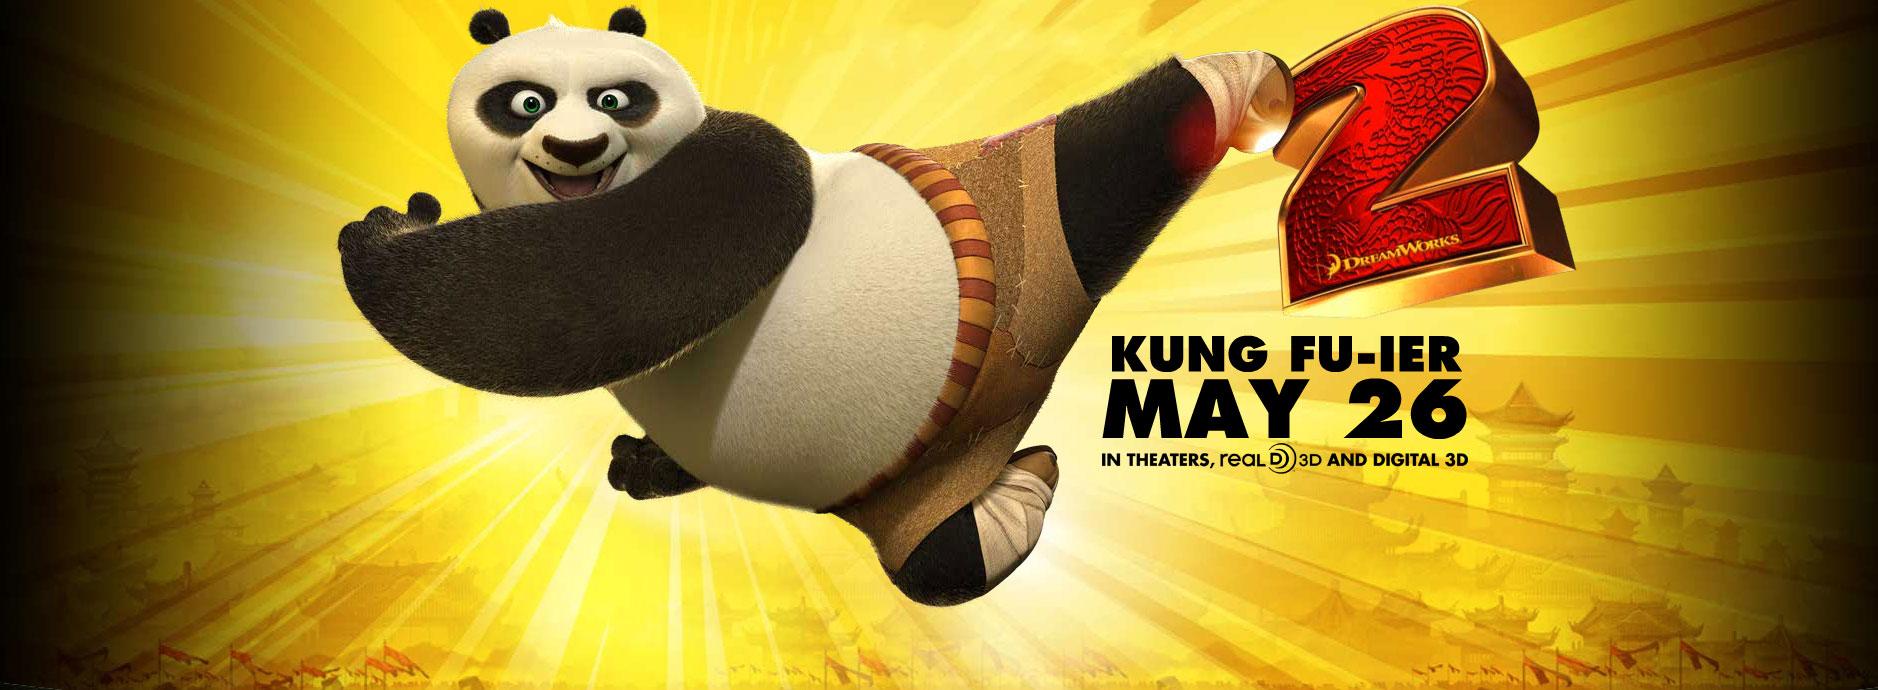 Po From Kung Fu Panda 2 Desktop Wallpaper